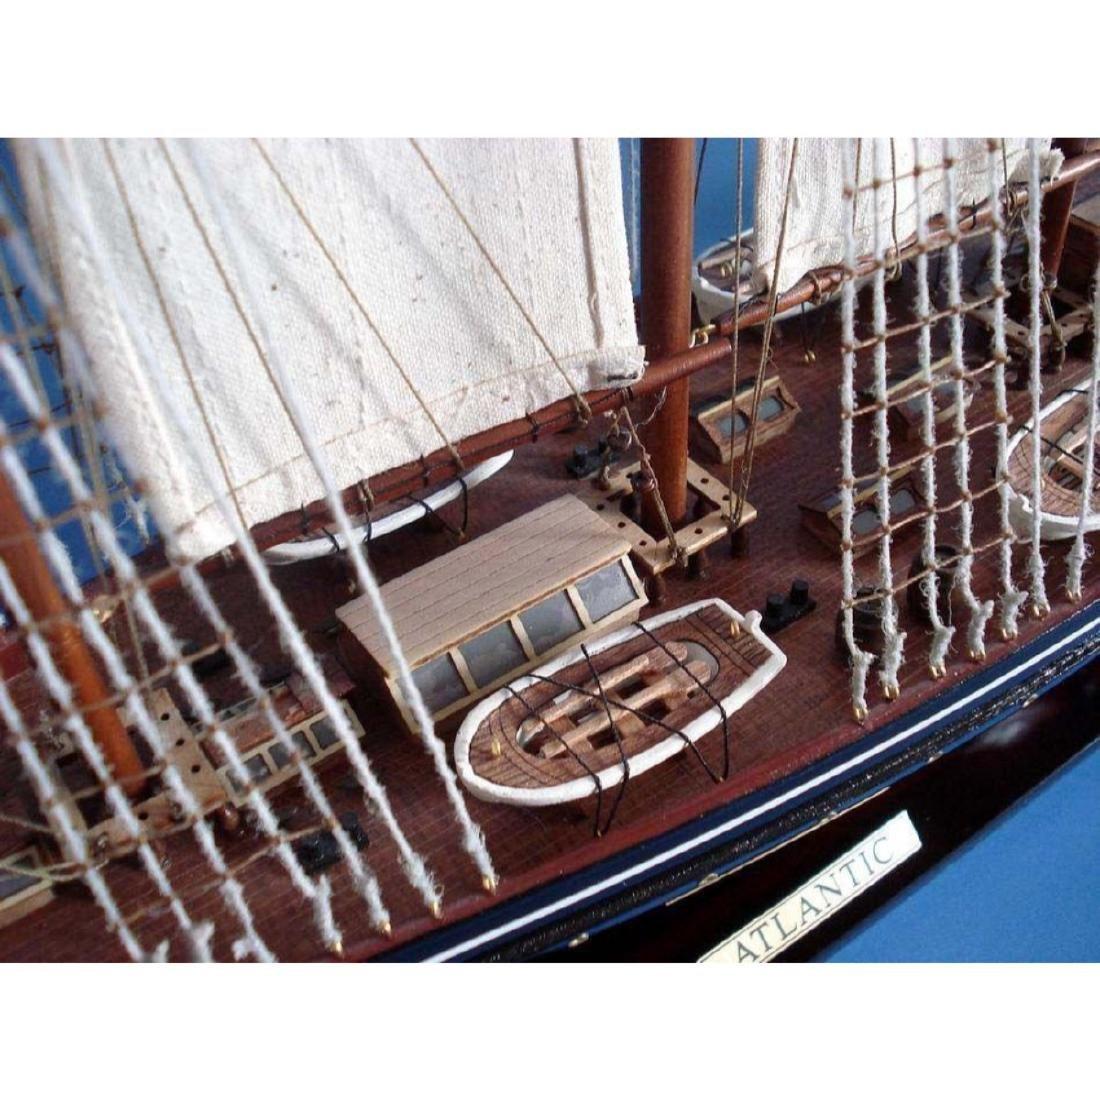 "Wooden Atlantic Limited Model Sailboat 32"" - 6"